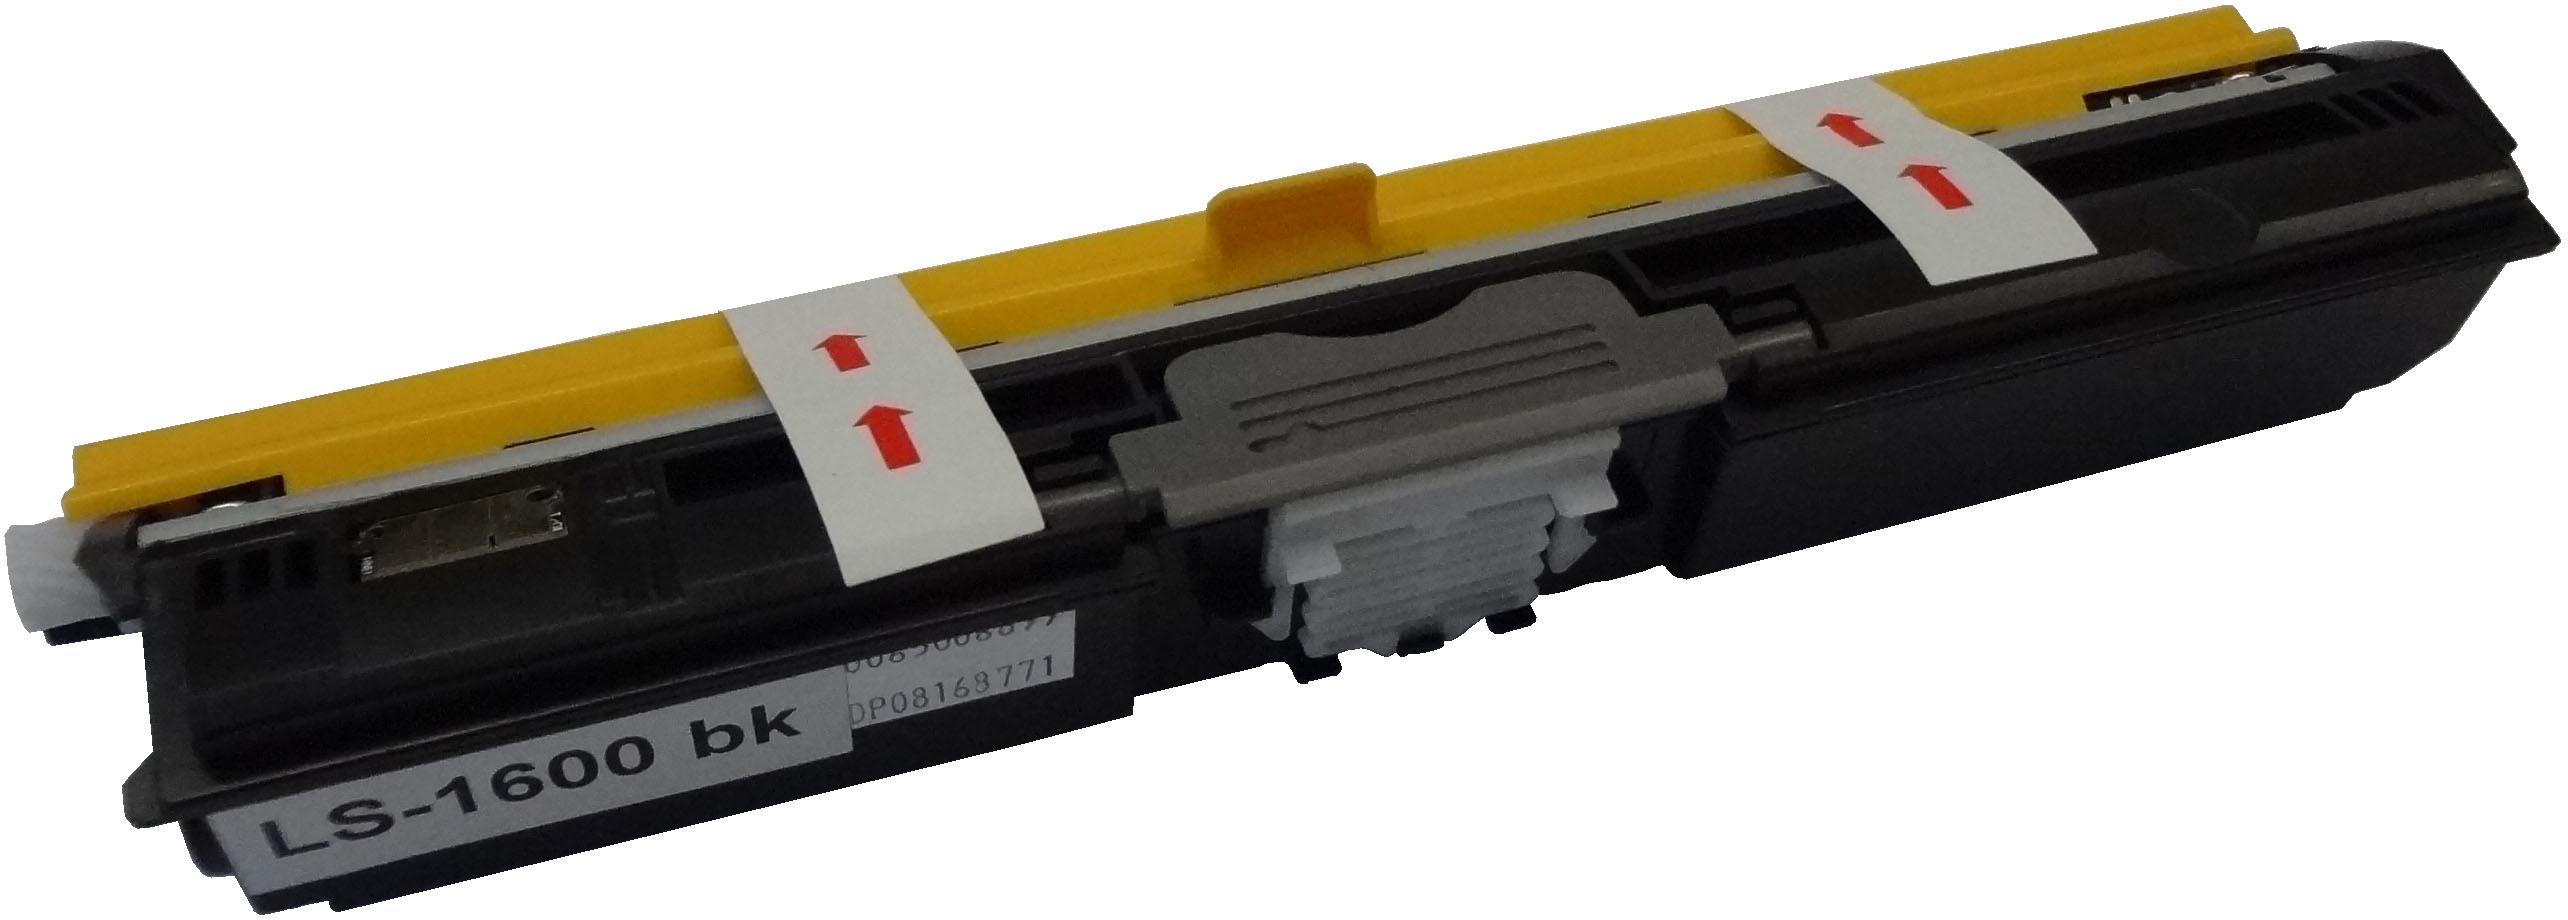 Huismerk Epson C1600 / CX16 zwart